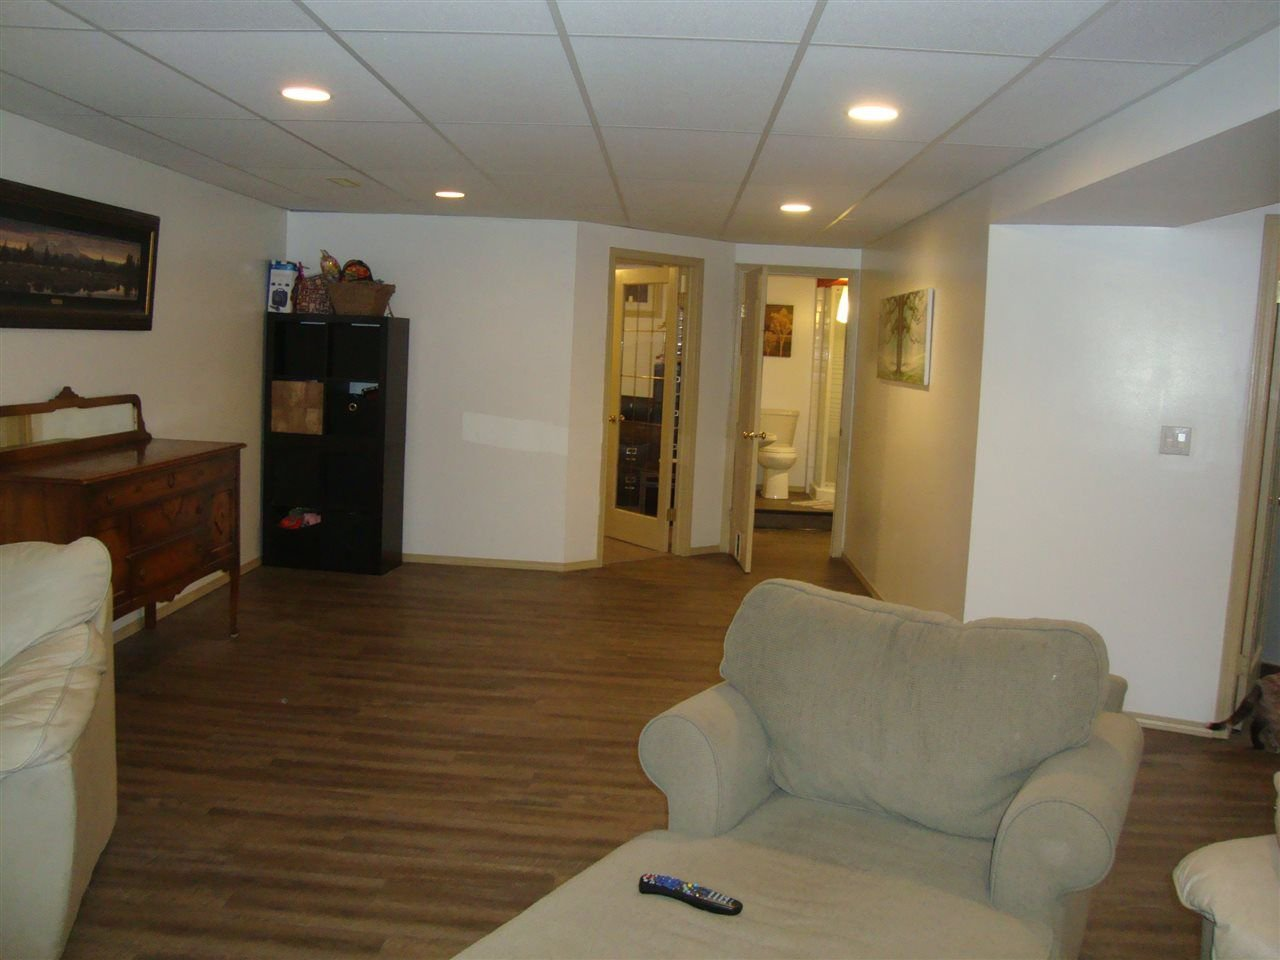 Photo 24: Photos: 4711 51A Avenue: Bon Accord House for sale : MLS®# E4149195